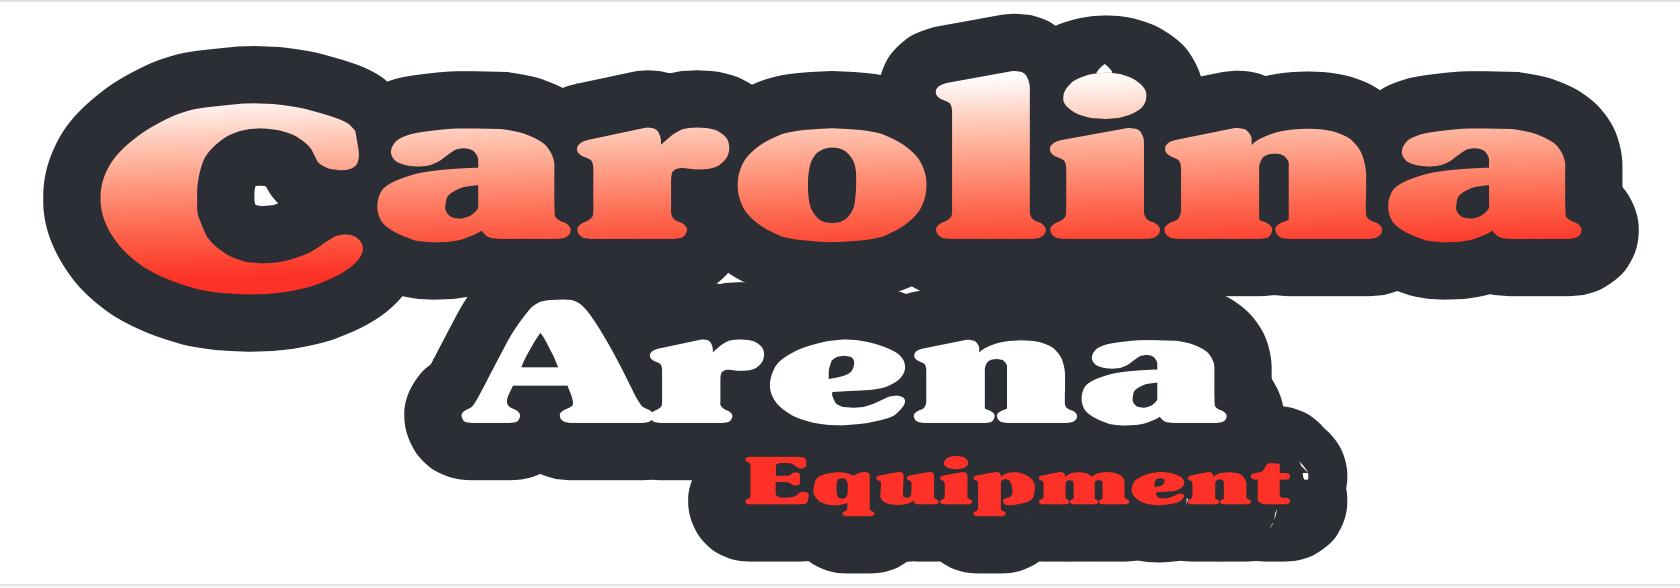 Carolina Arena Equipment